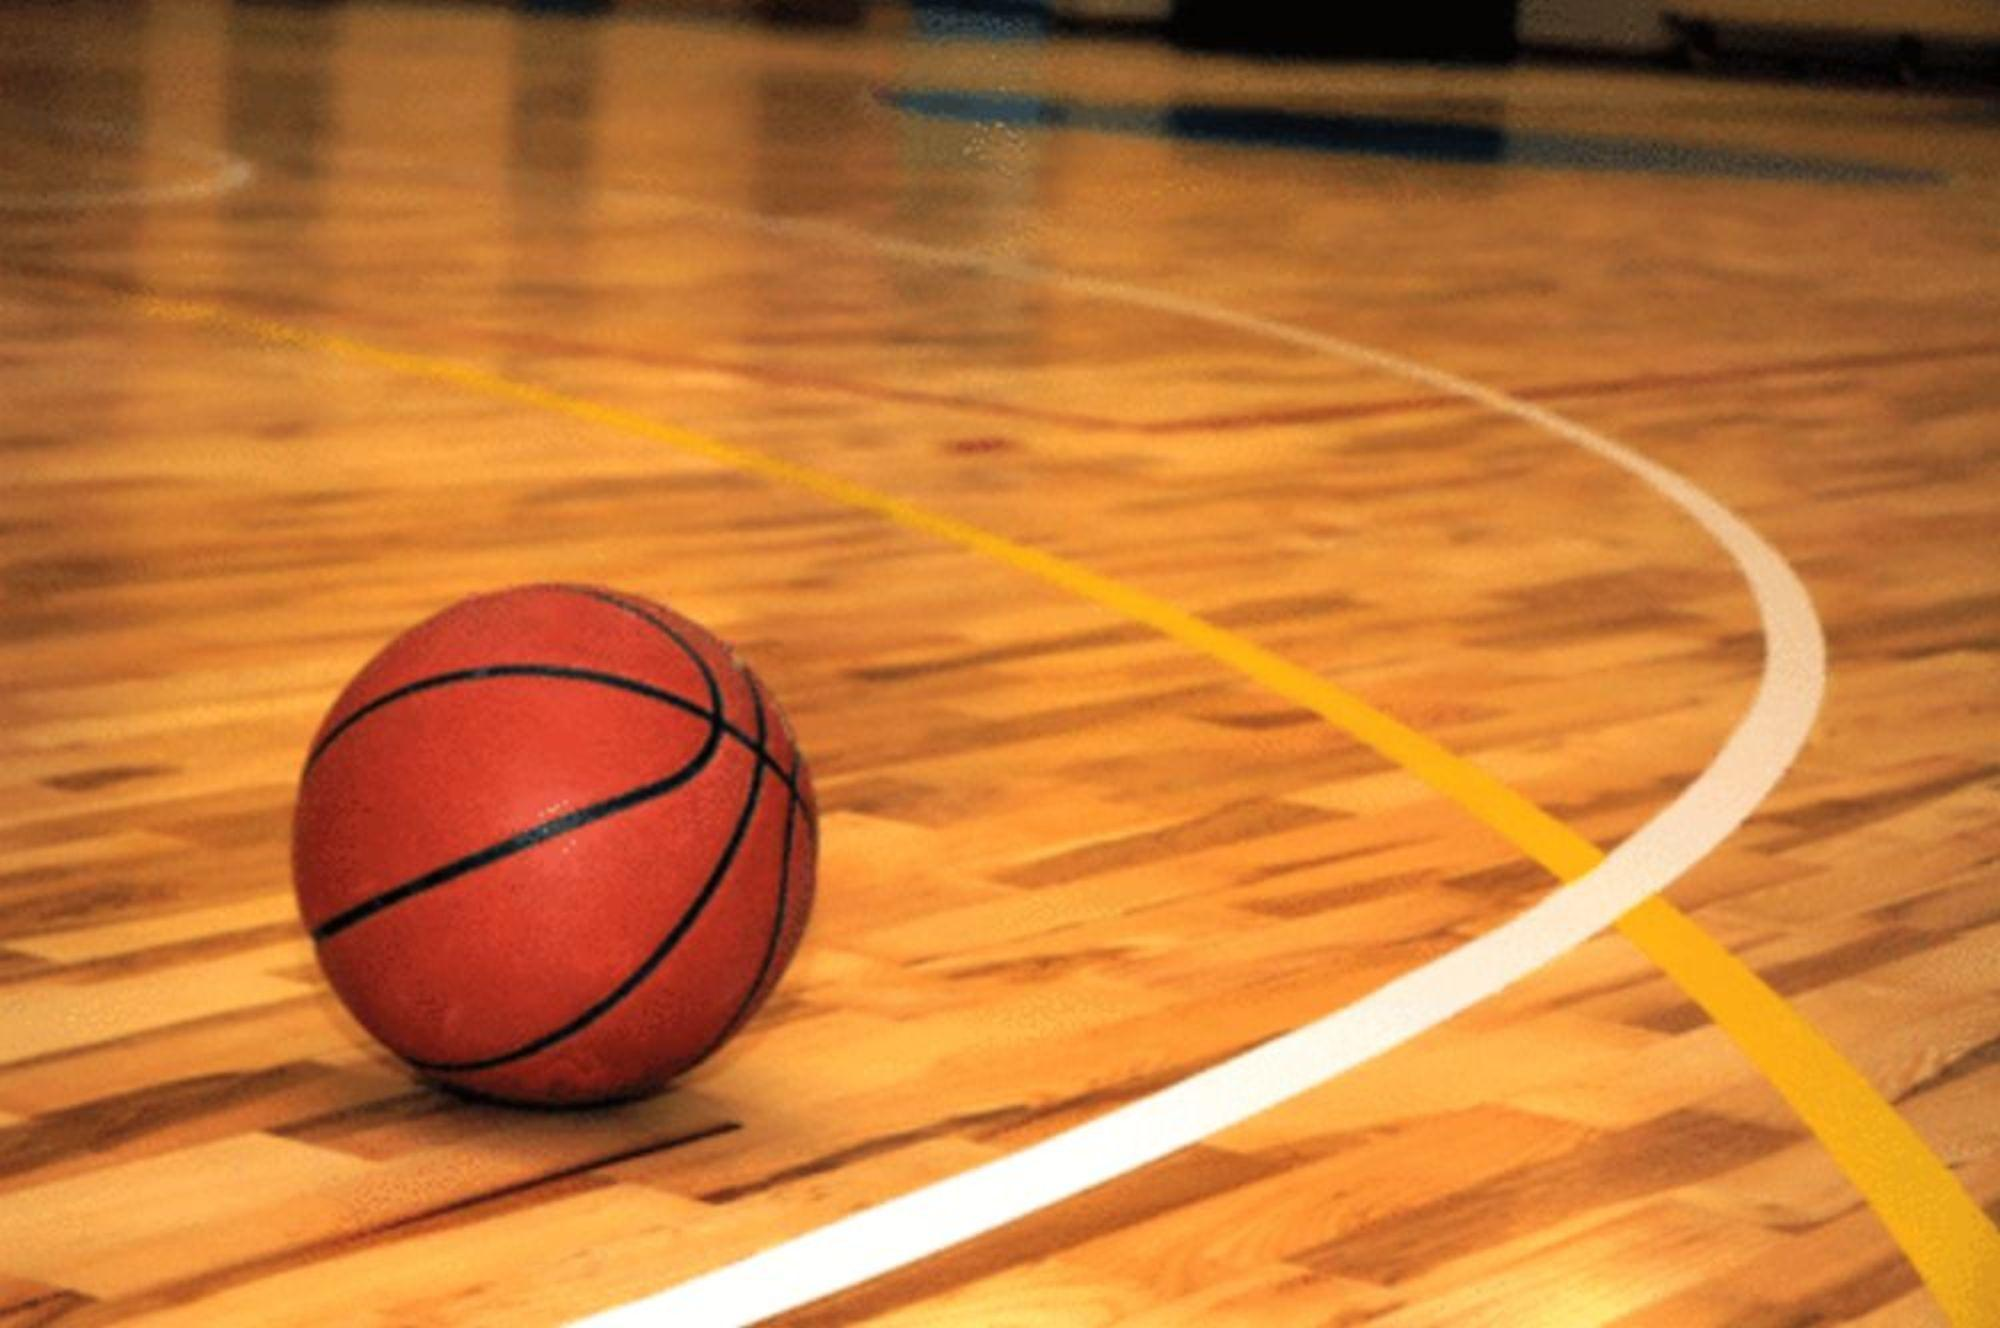 Wallpapers For u003e Indoor Basketball Court Wallpaper